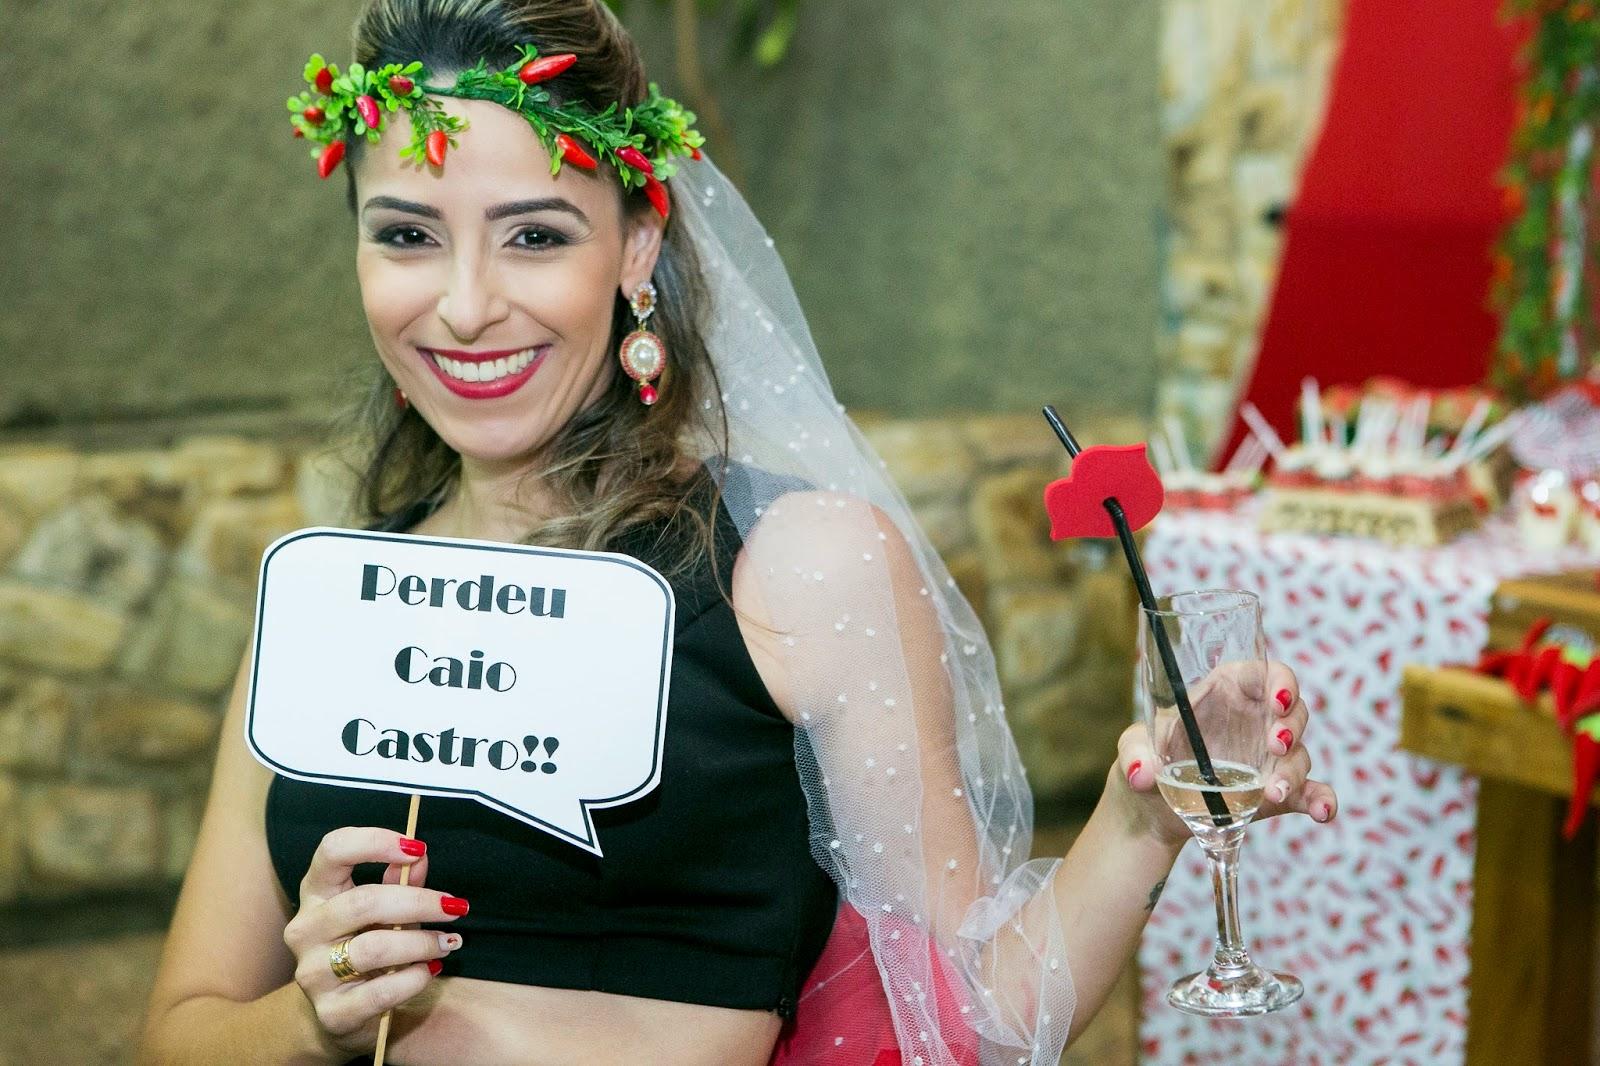 cha-lingerie-picante-tema-pimenta-photobooth-noiva-coroa-pimenta